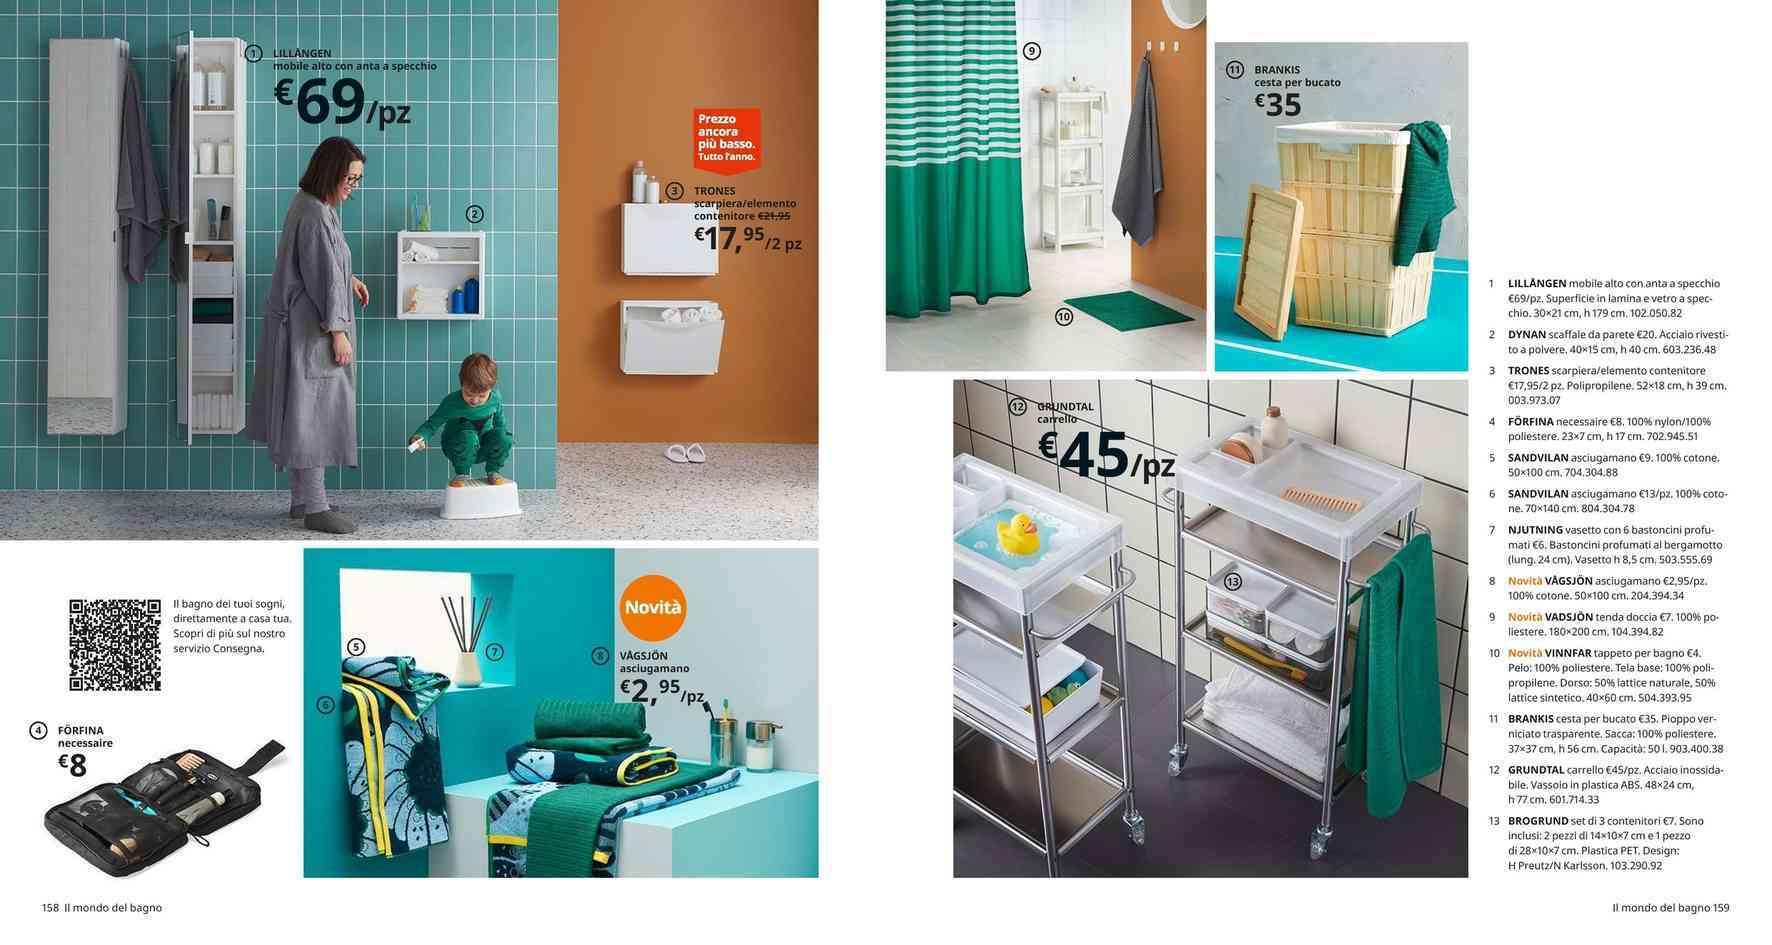 Cesta Bucato Leroy Merlin offerte tenda doccia, negozi per arredare casa - promoqui